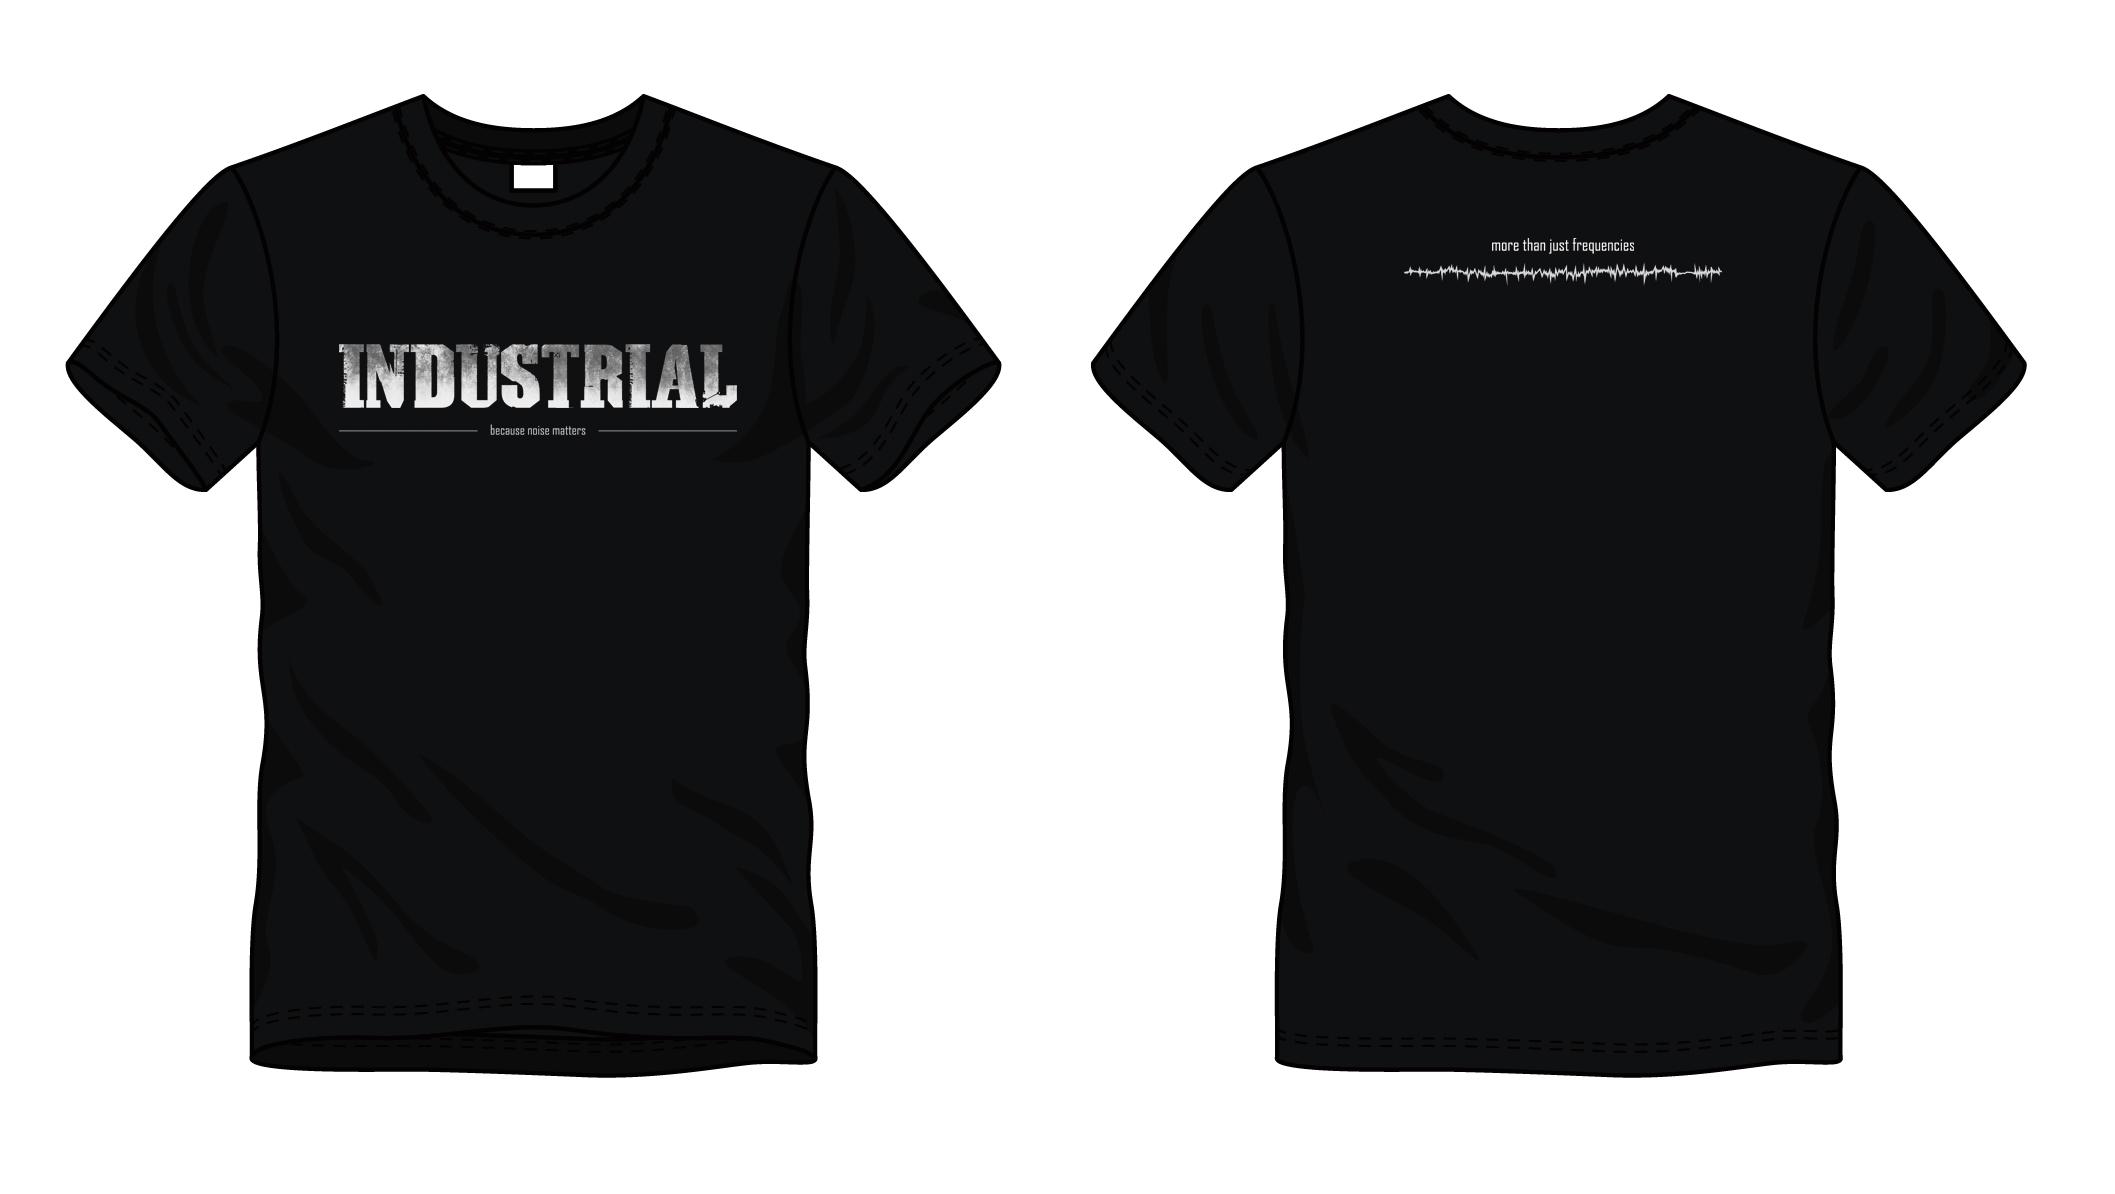 Black t shirt front and back plain - Black T Shirt Front And Back Plain 8